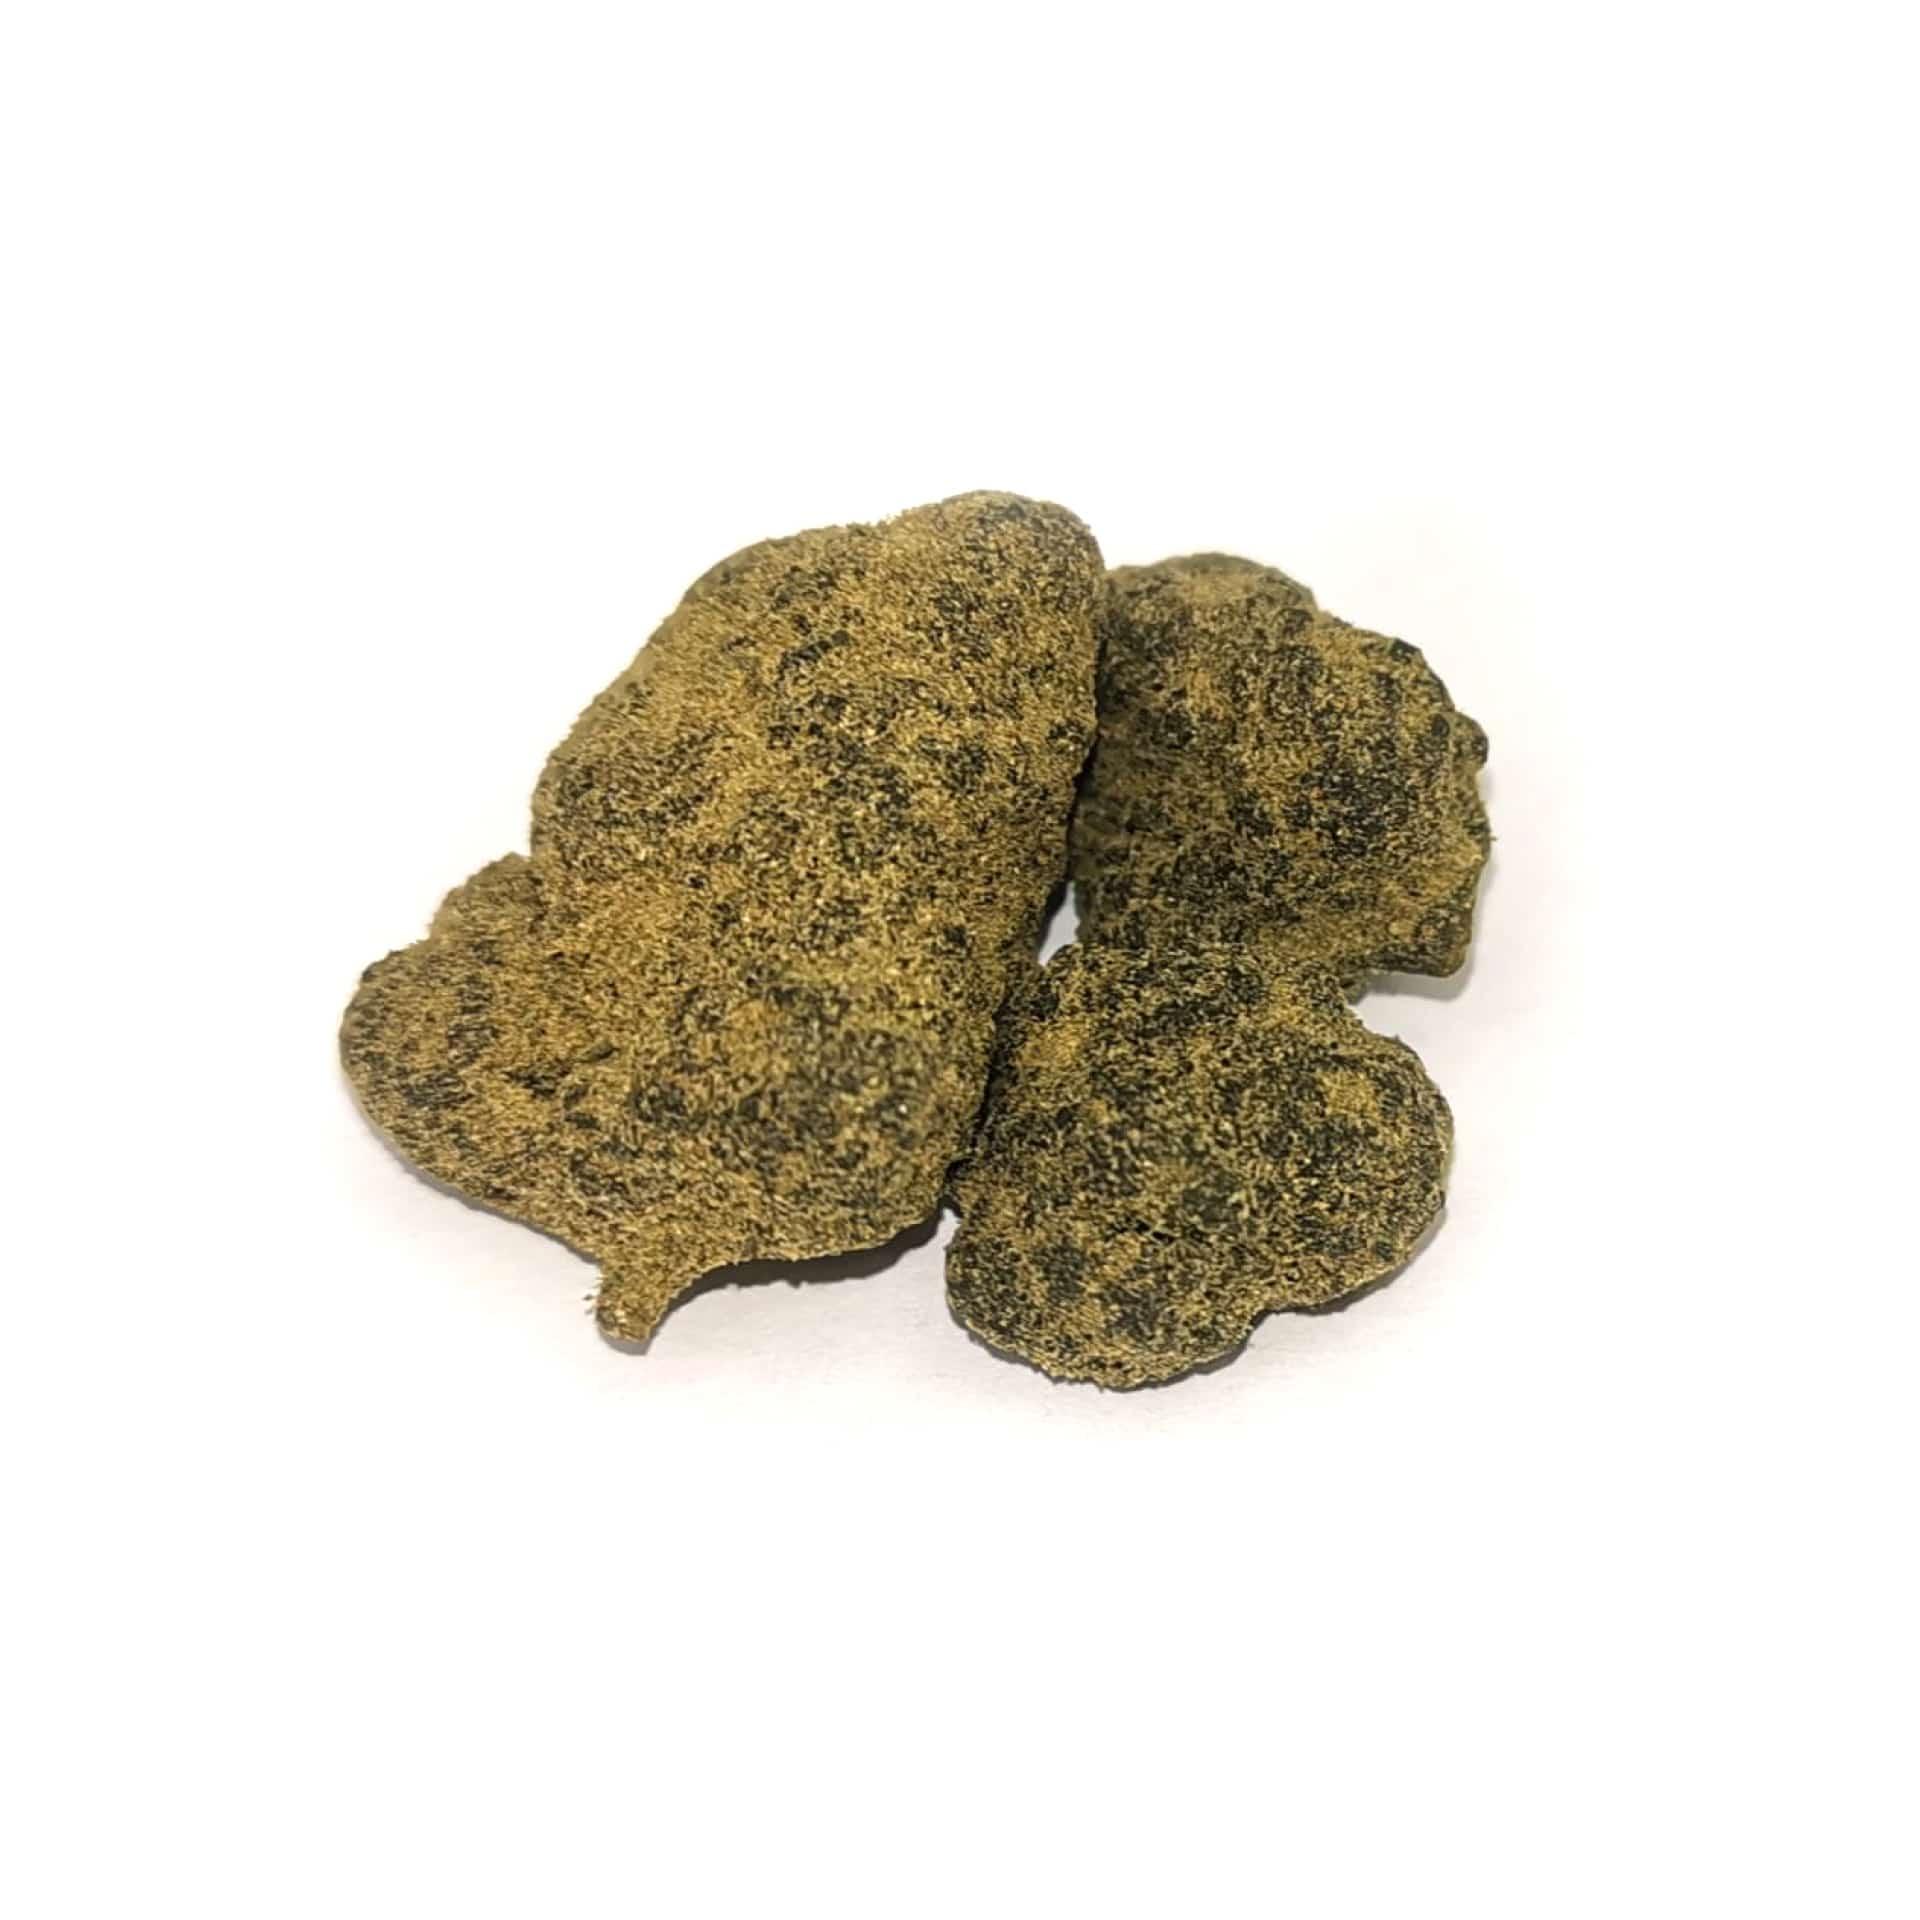 Moonrock-bud-cbd